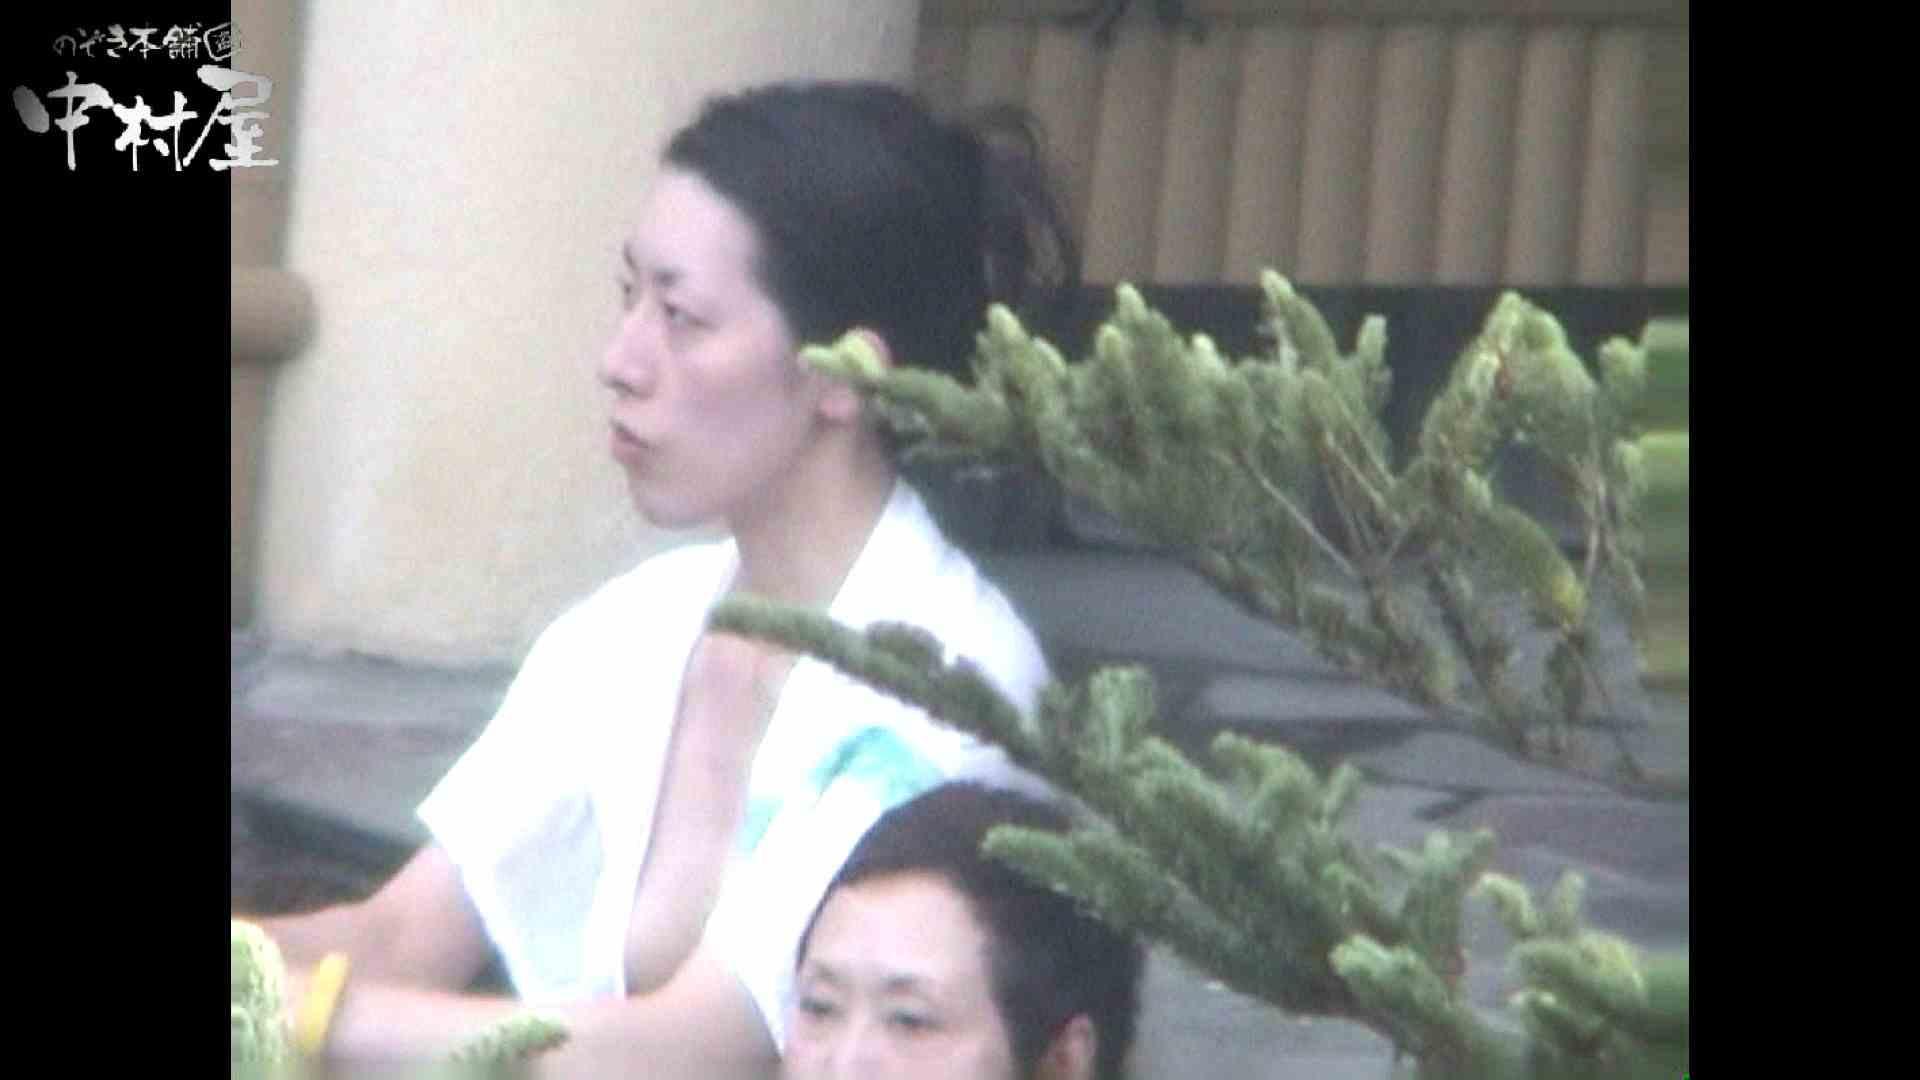 Aquaな露天風呂Vol.960 OLセックス 盗撮セックス無修正動画無料 65画像 14